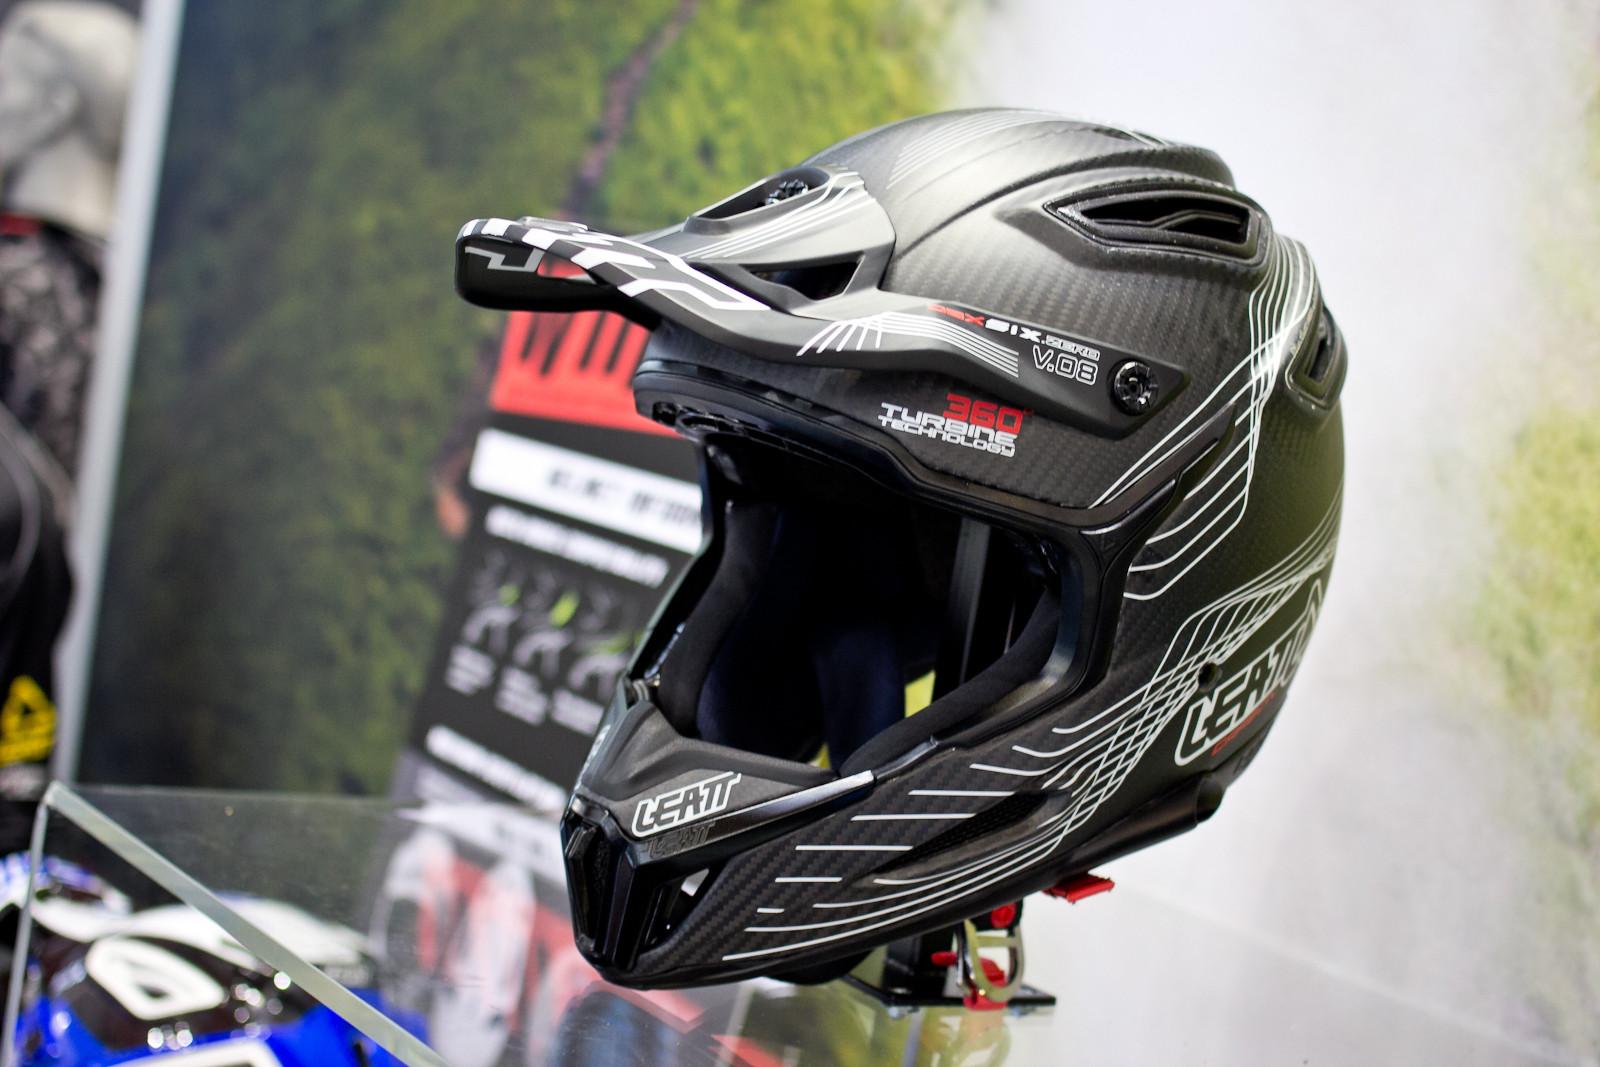 Leatt DBX 6.5 V10 Carbon Helmet - 2015 Mountain Bike Apparel & Protection at Eurobike 2014 - Mountain Biking Pictures - Vital MTB